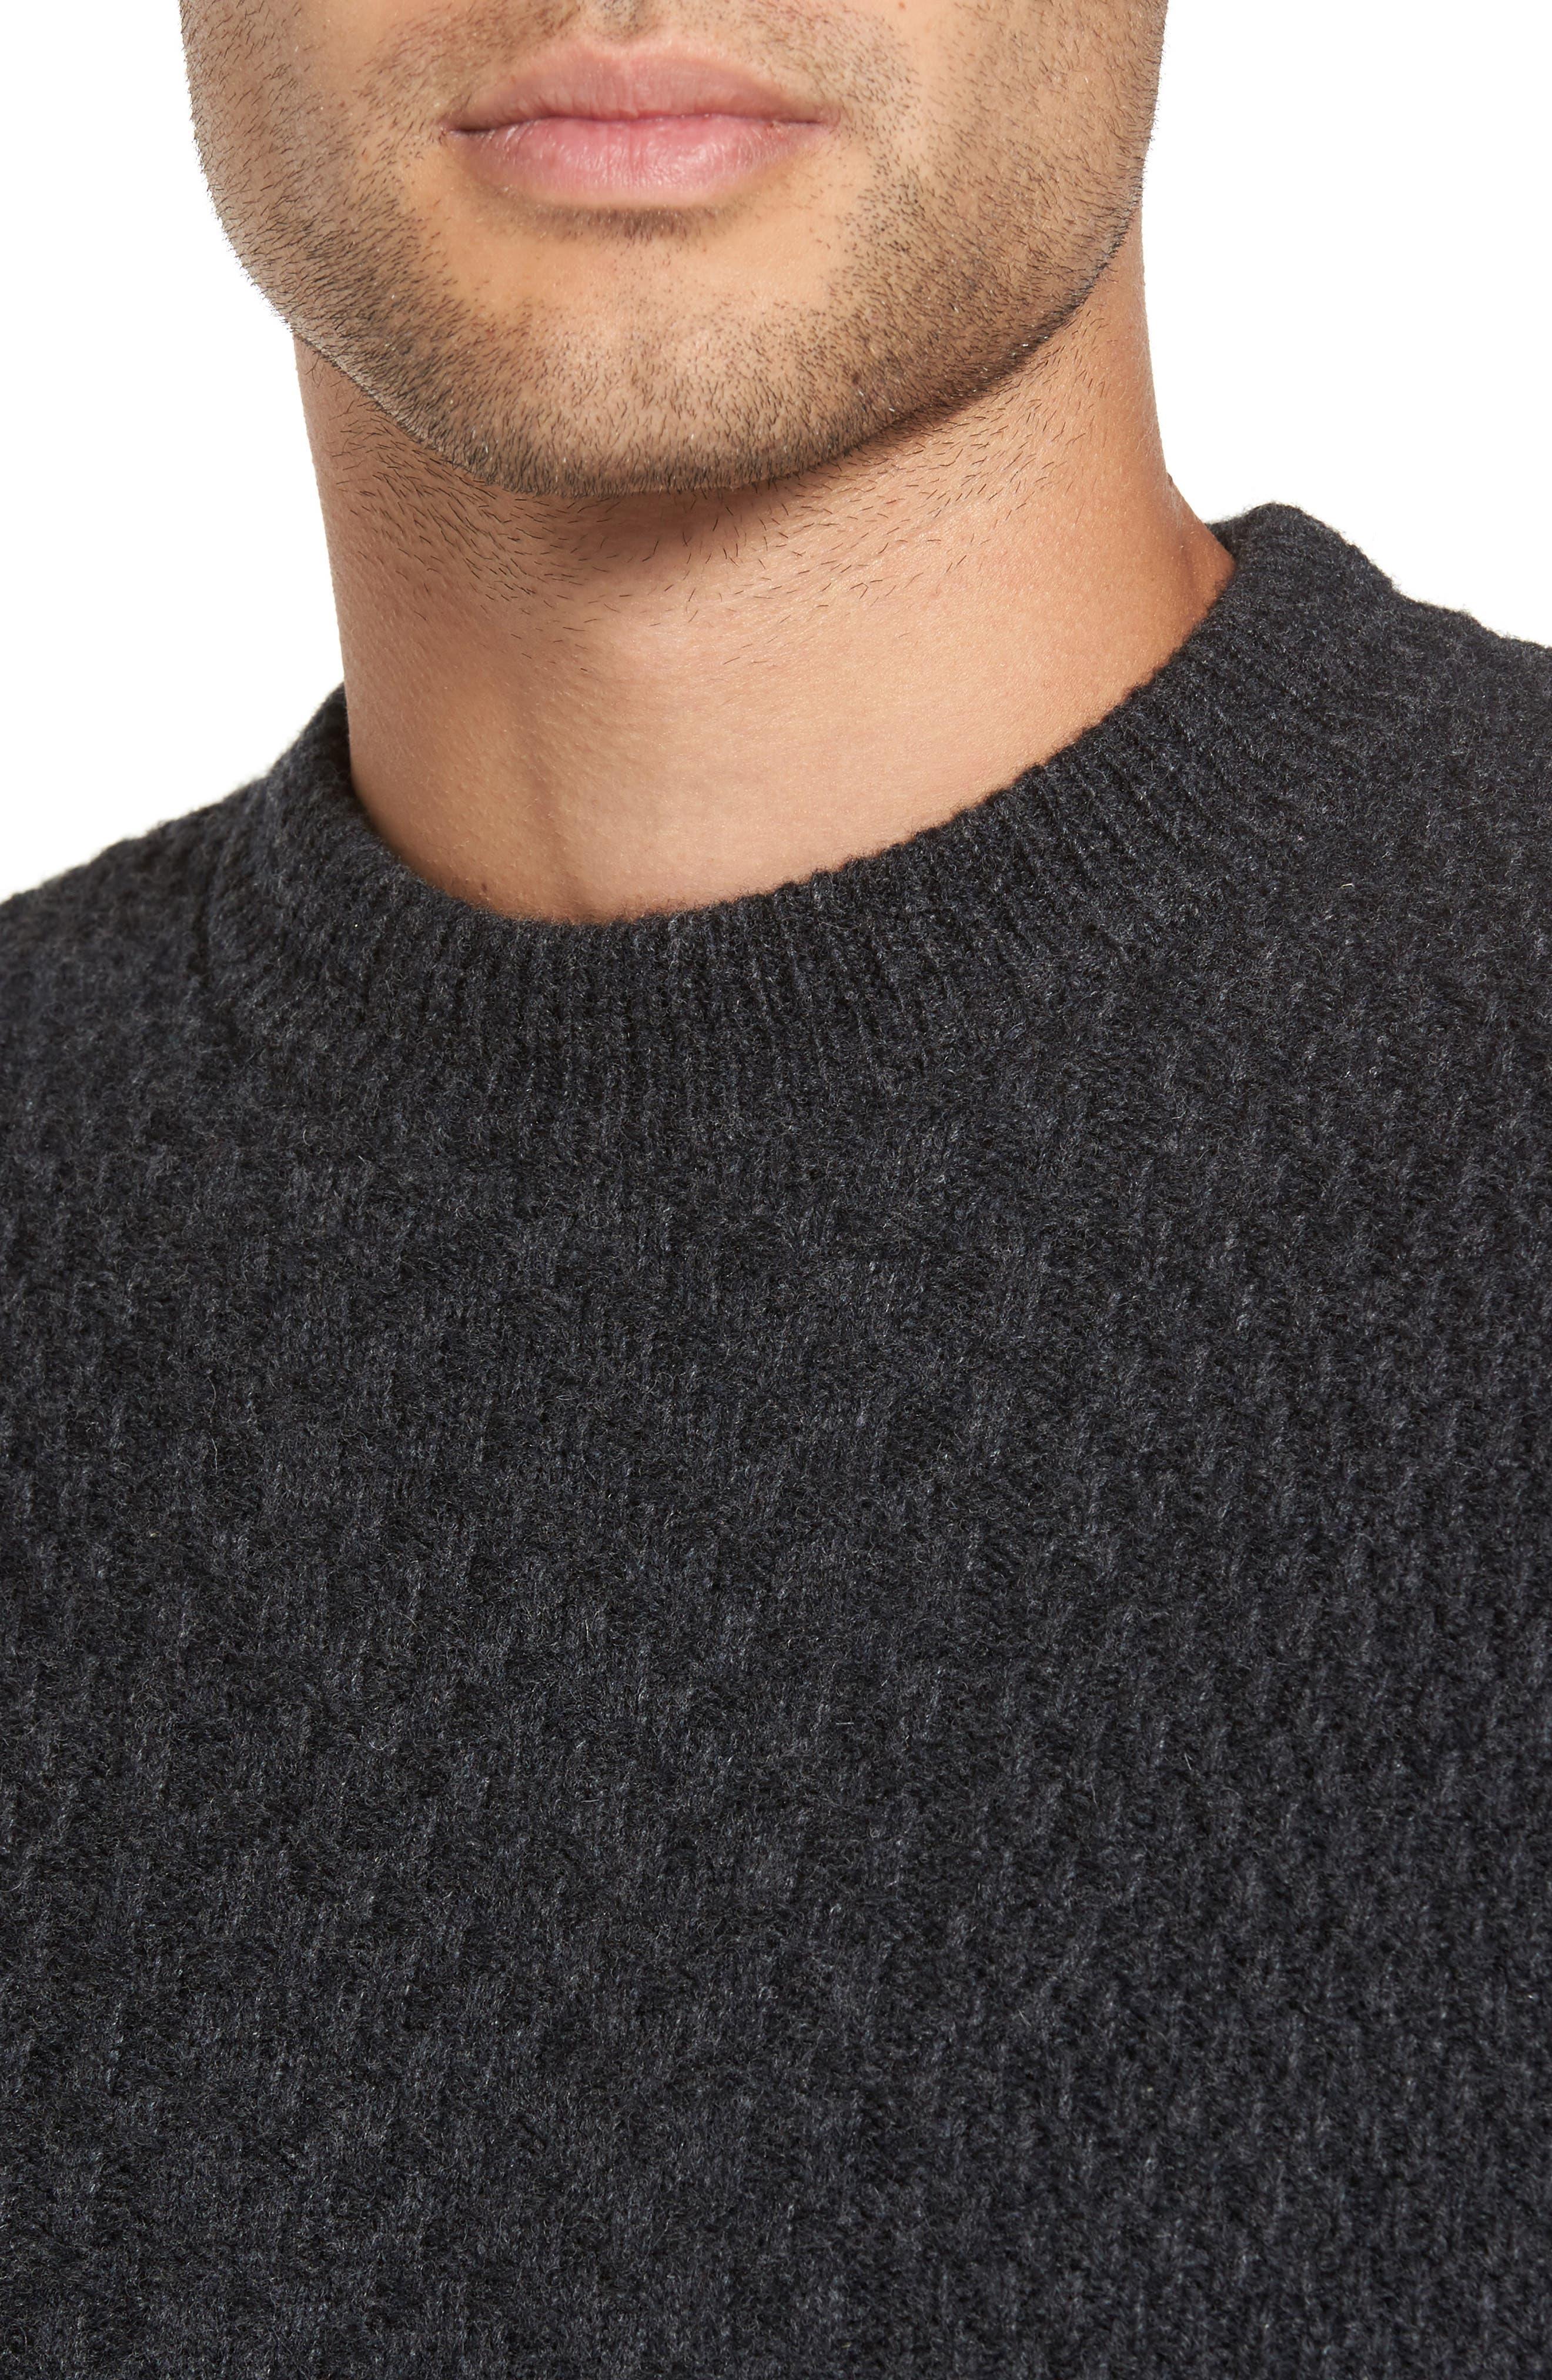 Wool Crewneck Sweater,                             Alternate thumbnail 4, color,                             020